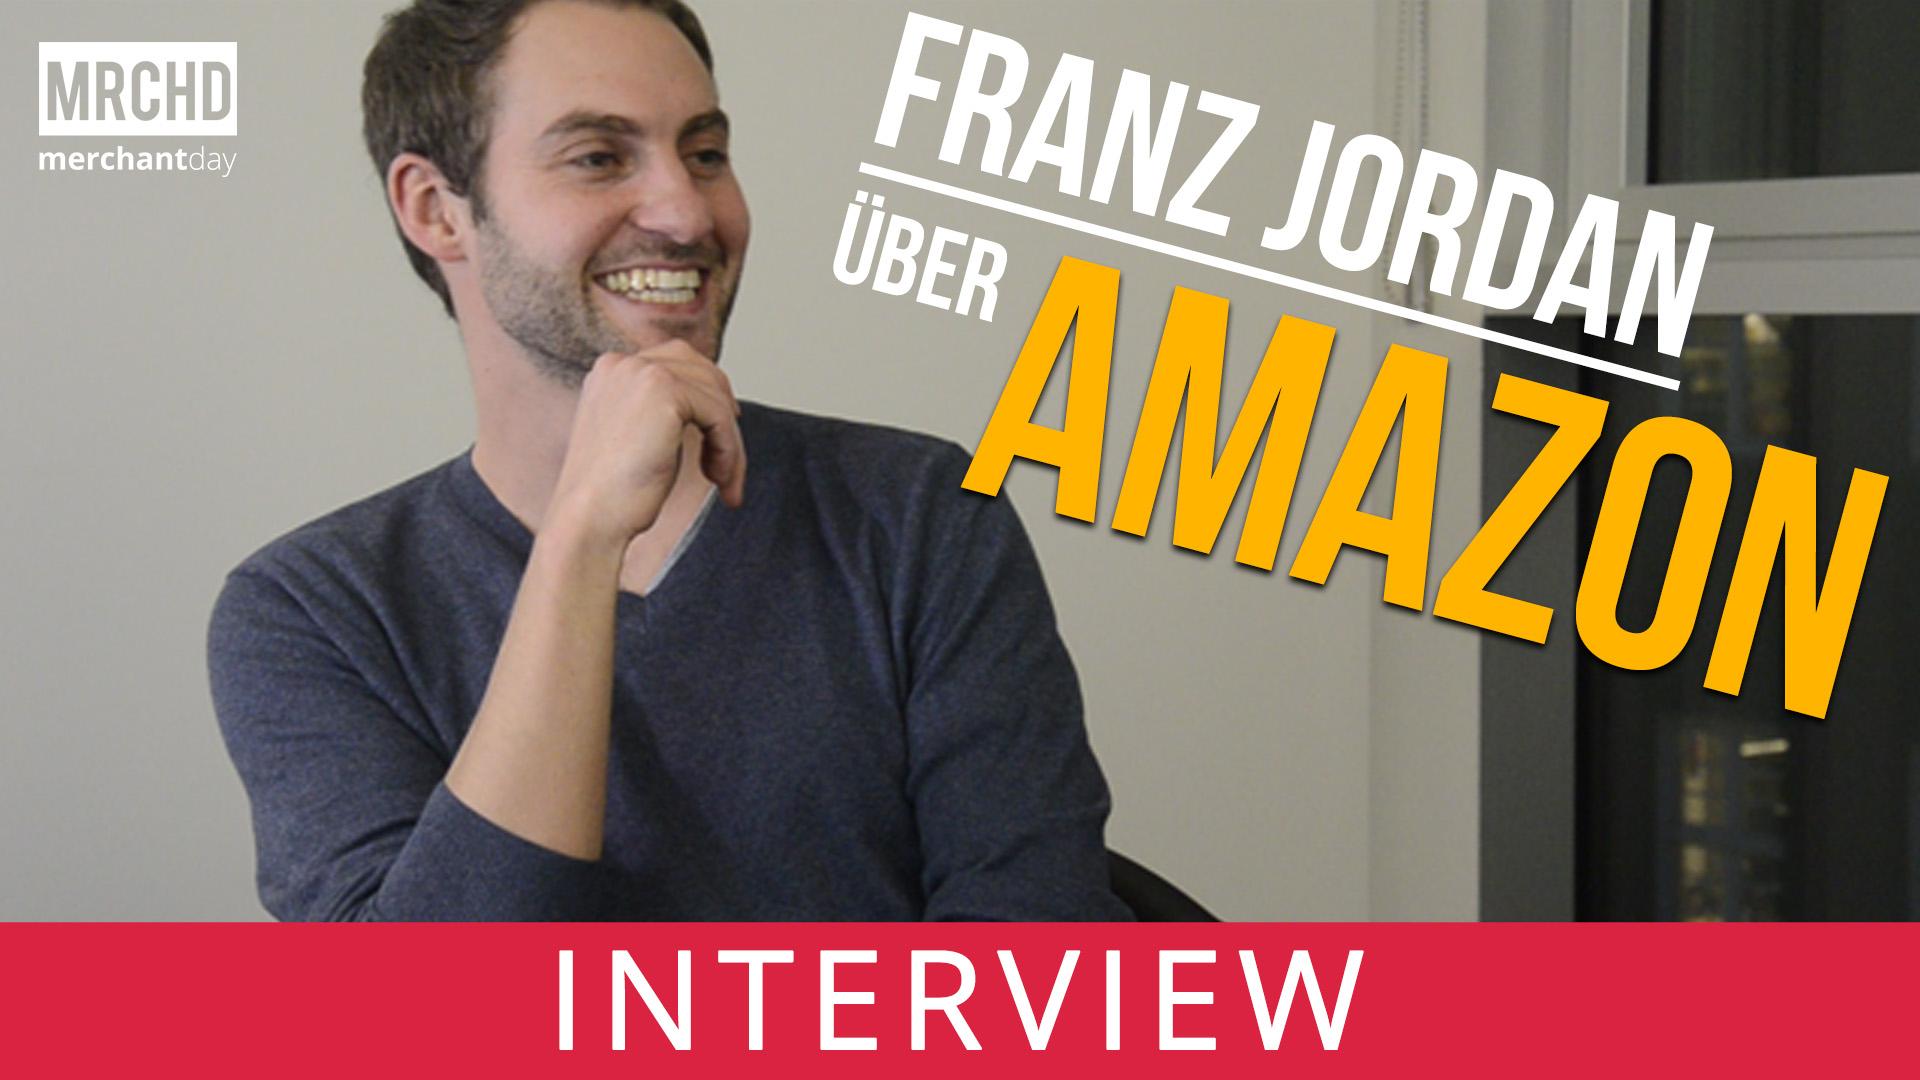 Verkaufen bei Amazon? – Franz Jordan sagt dir wie!